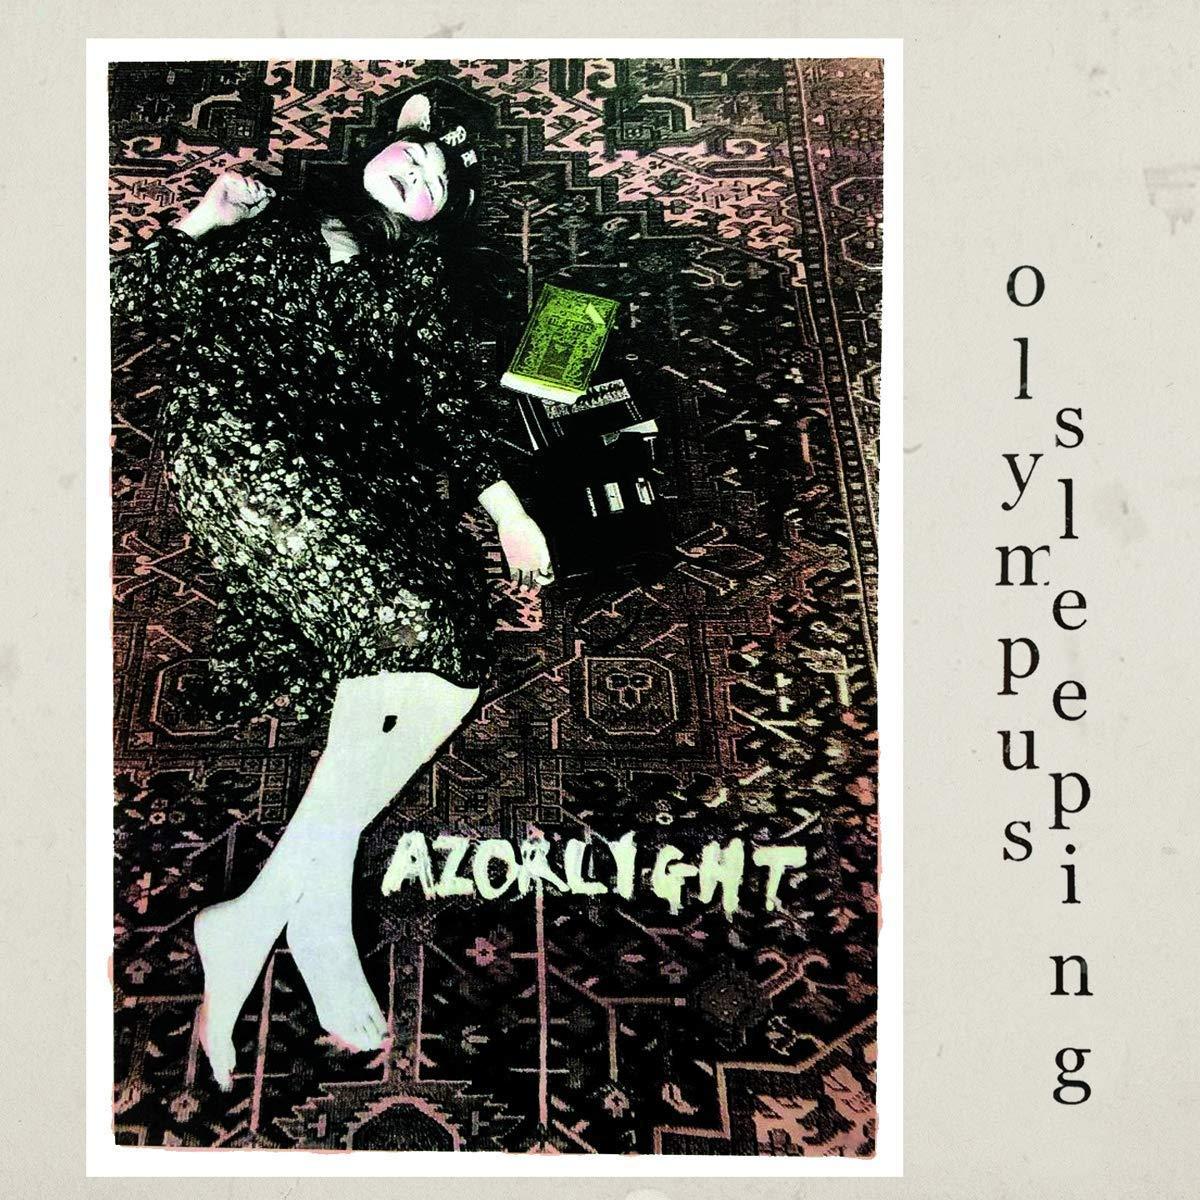 Vinilo : Razorlight - Olympus Sleeping (LP Vinyl)